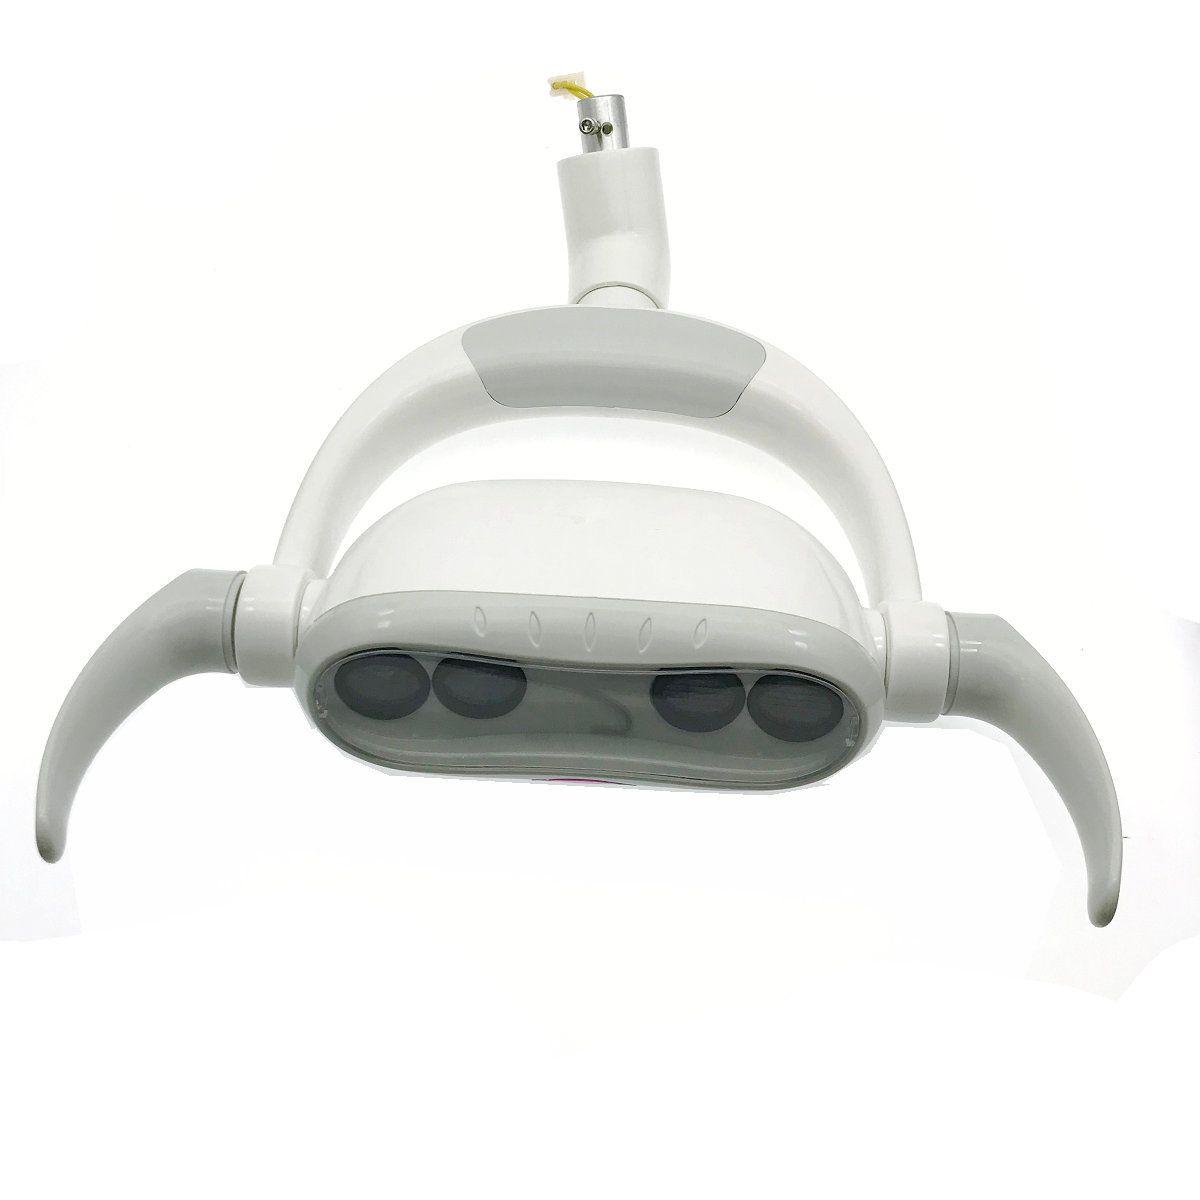 1set High quality Dental LED Oral Light LED Induction Lamp For Dental Unit Chair dental operation lamp joint size 22mm AC12V